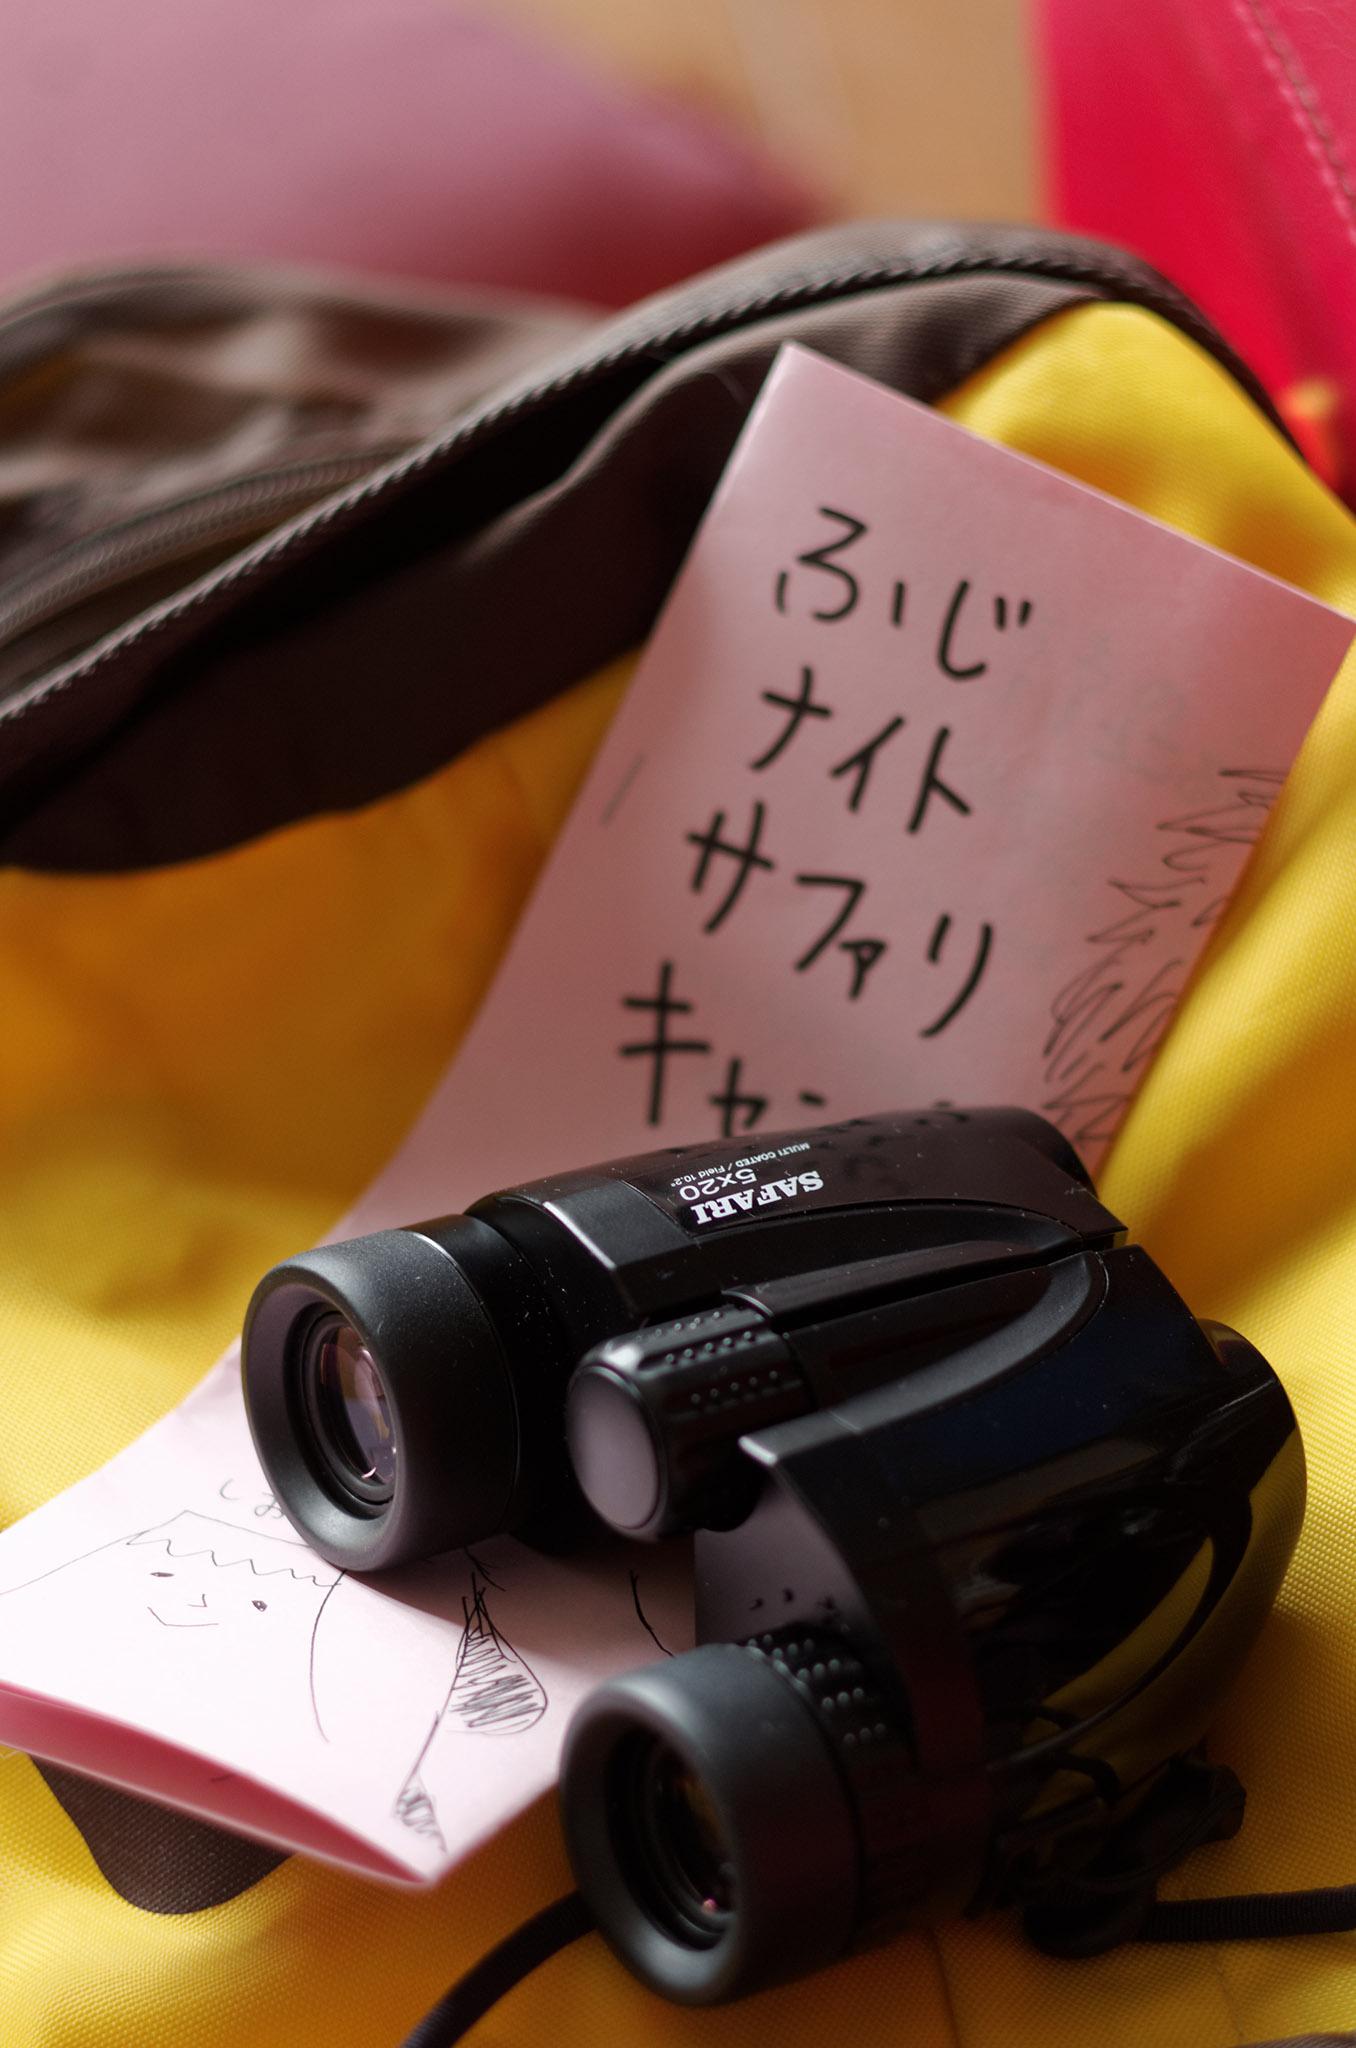 IMGP0275_DxO.jpg